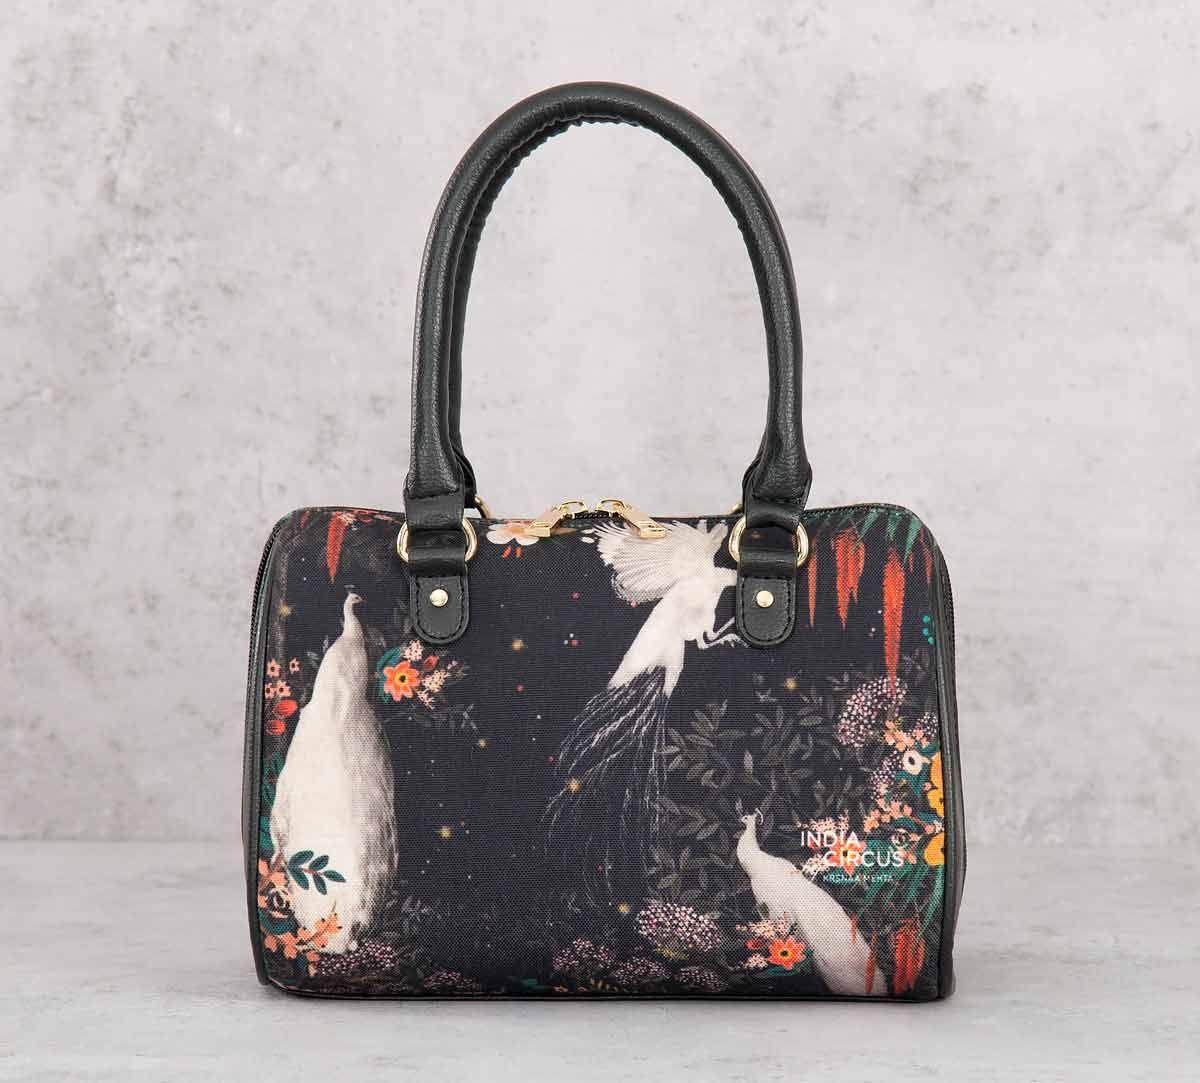 India Circus Vintage Spring Small Duffle Bag